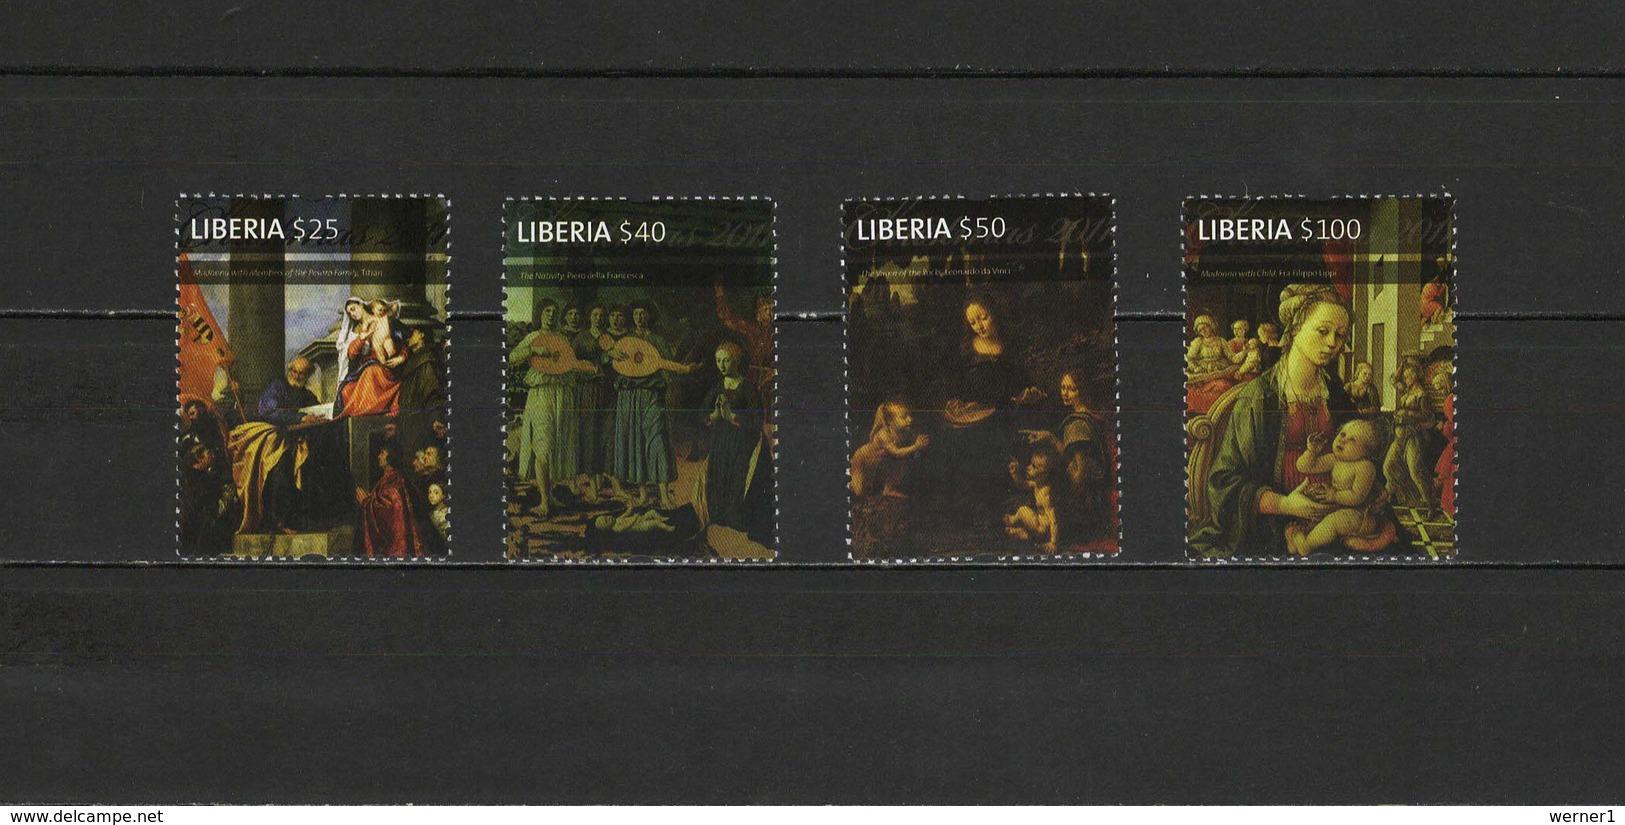 Liberia 2011 Paintings Titian - Tiziano, Da Vinci Etc. Set Of 4 MNH - Arte